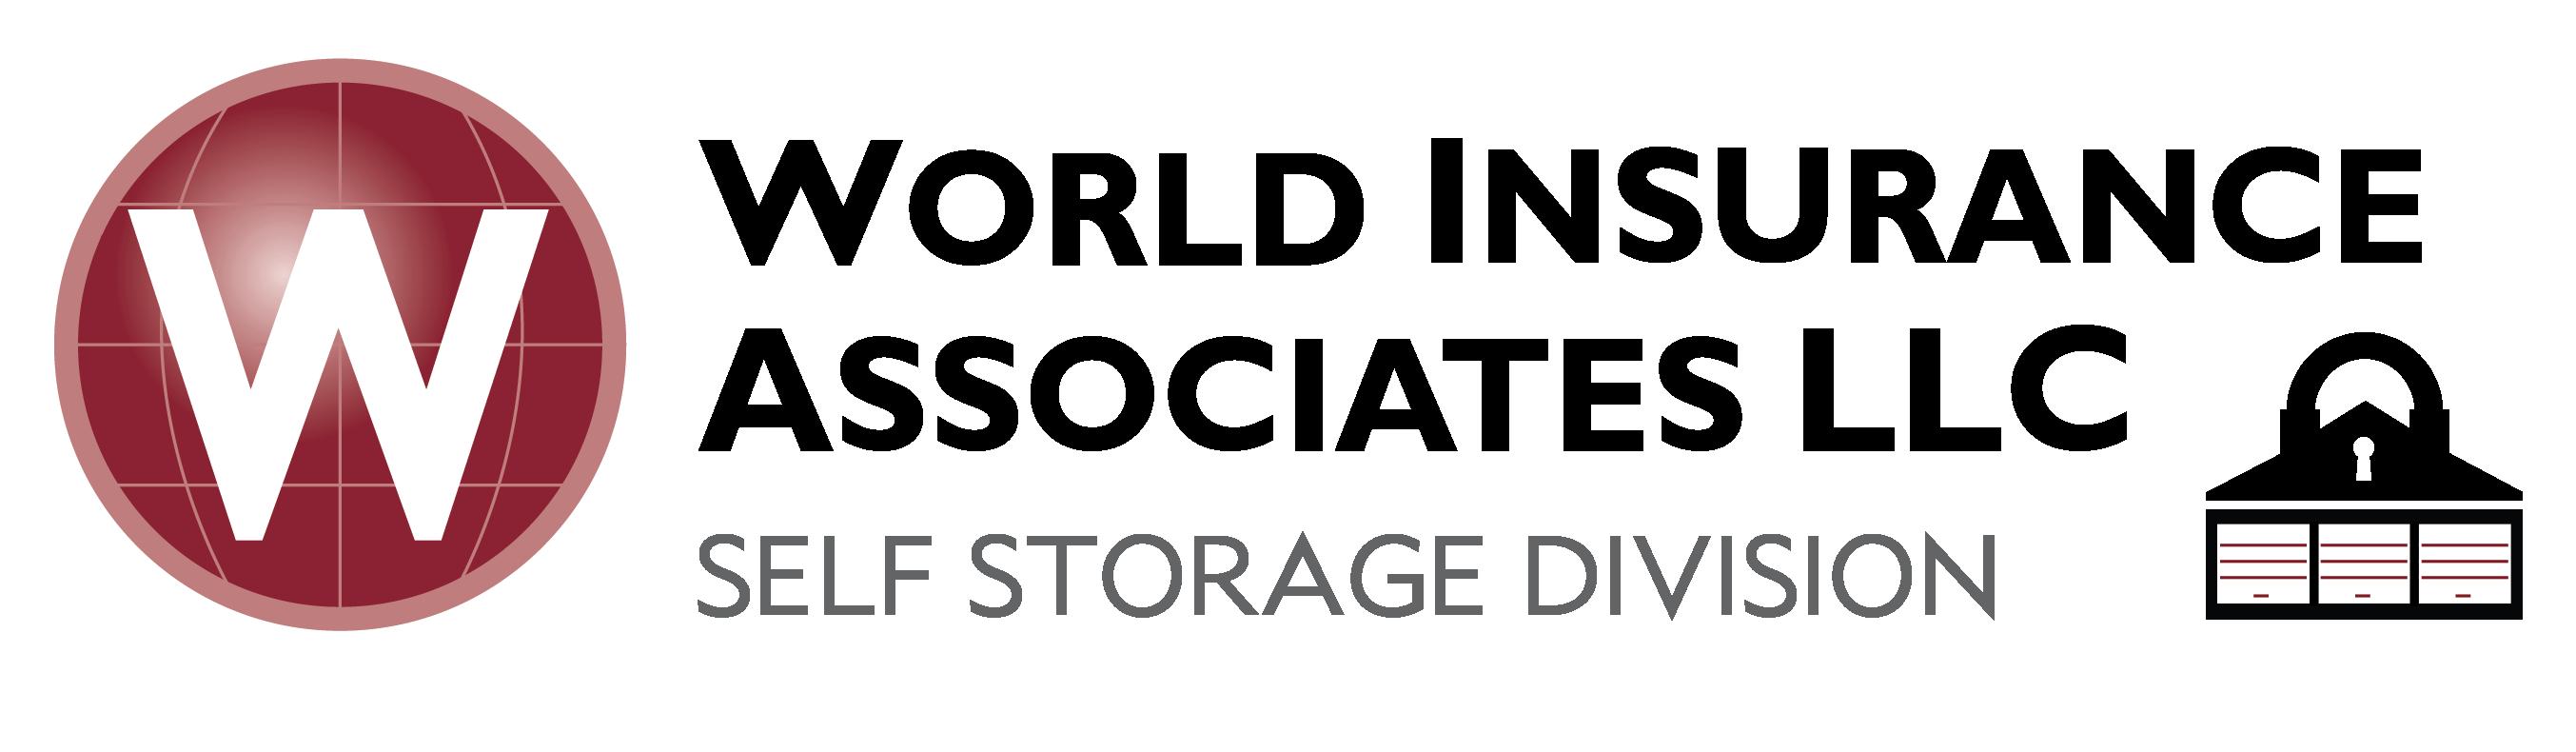 World Insurance Associates LLC - Self Storage Division